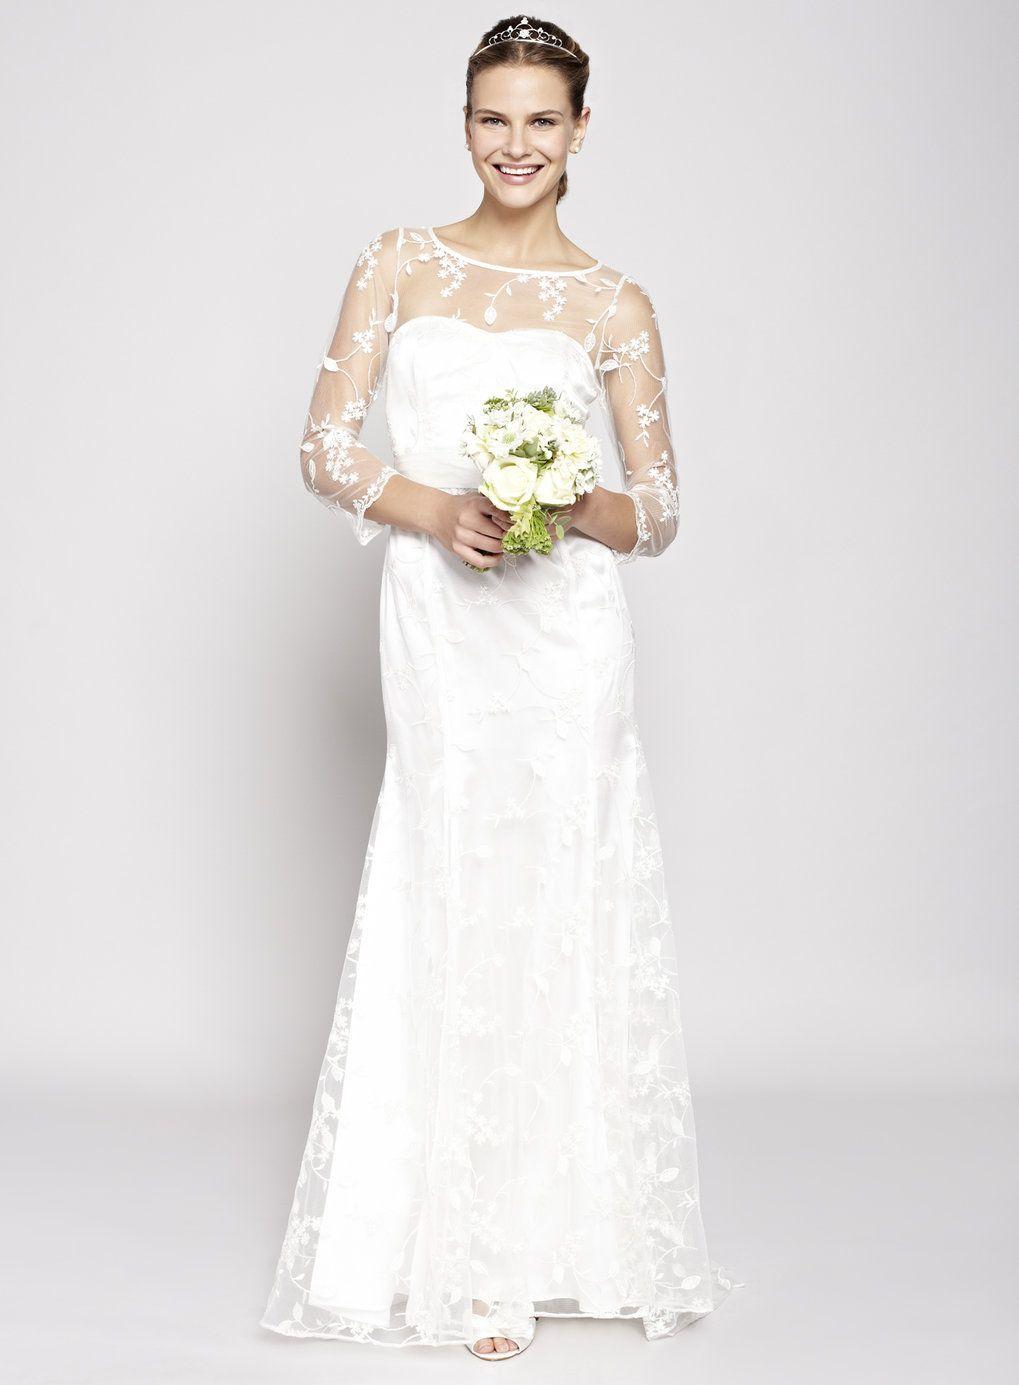 Ivory Violet Wedding Dress Bhs Wedding Dresses Size 14 Wedding Dress Long Sleeve Wedding Dresses